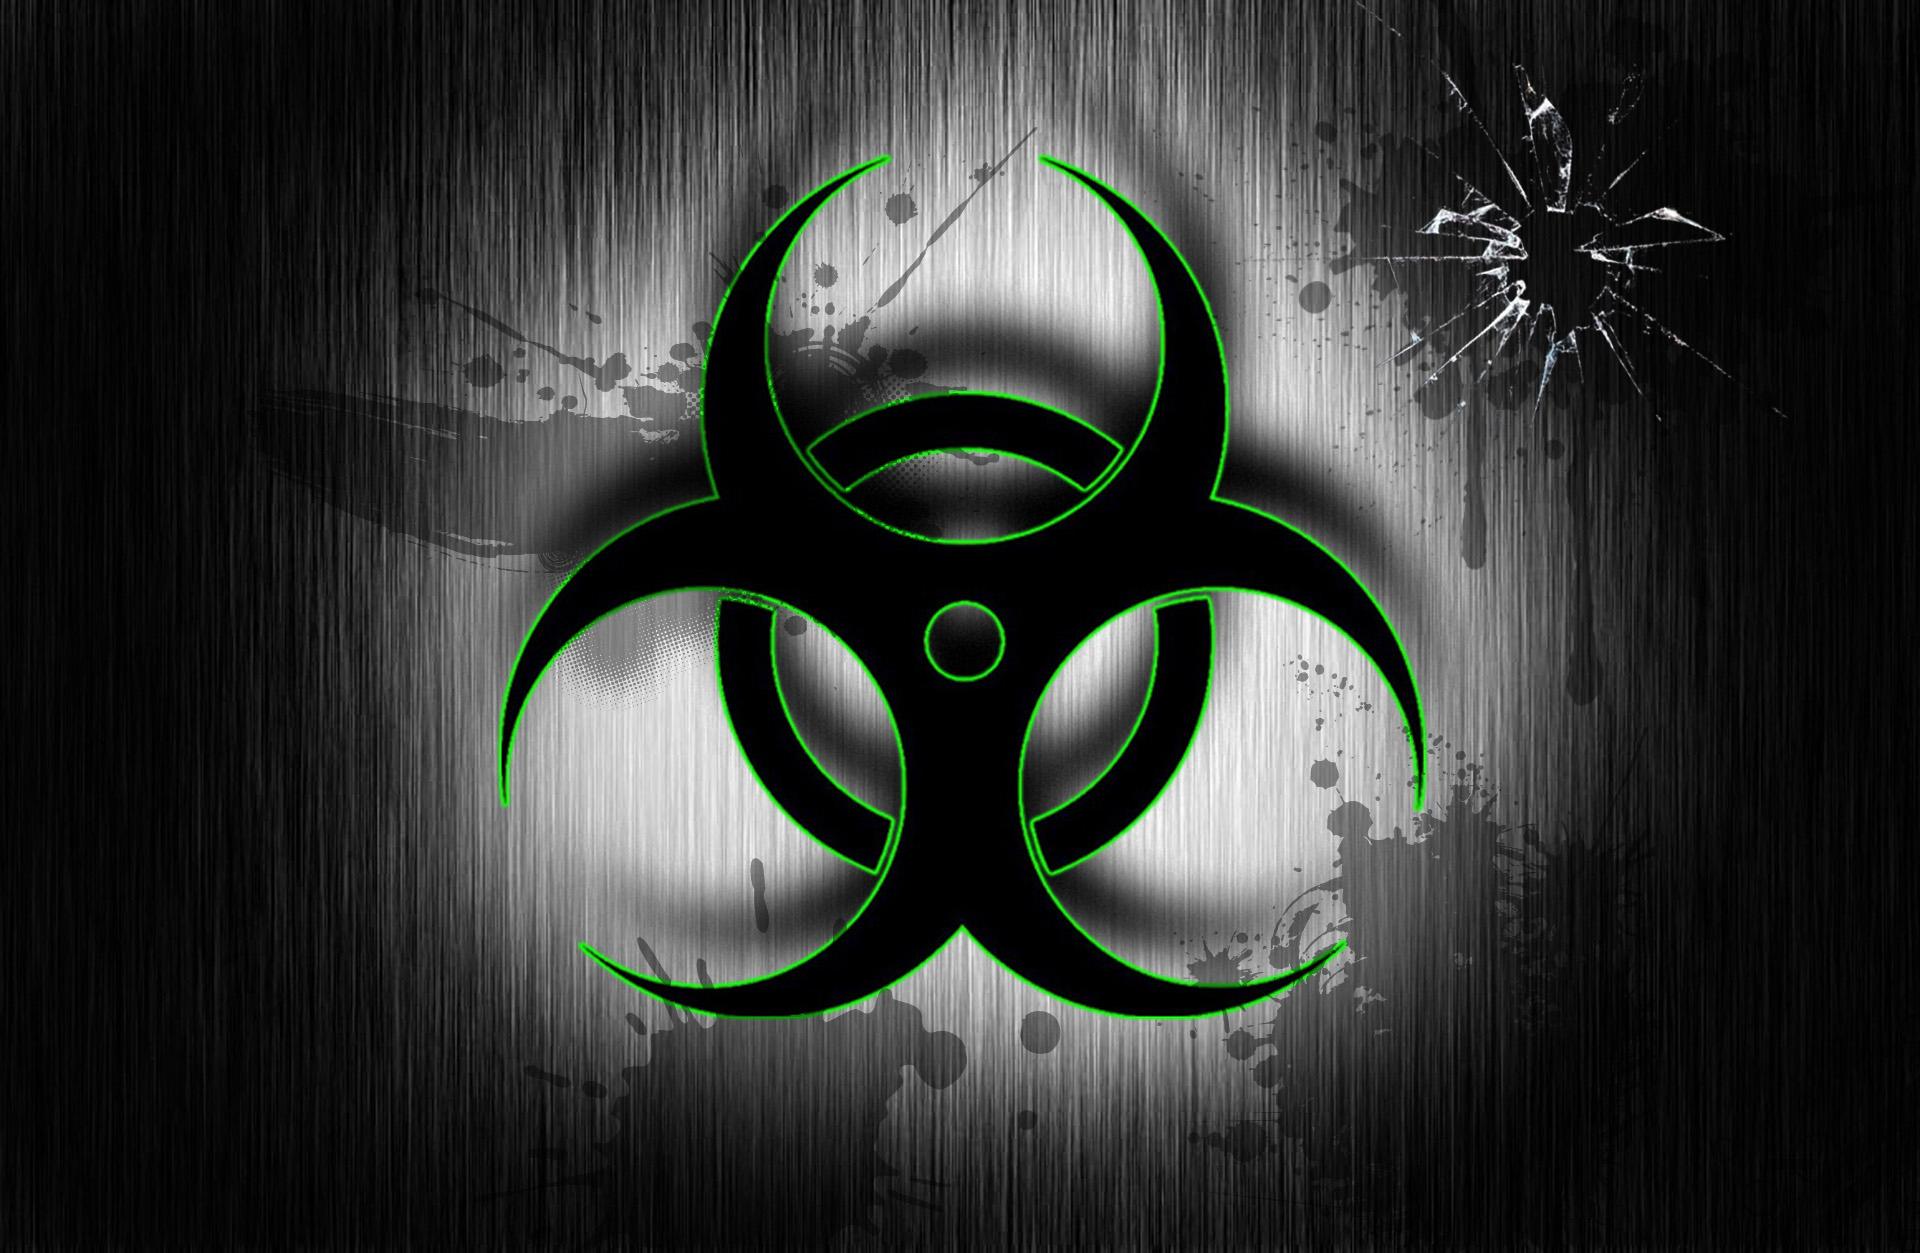 Biohazard wallpaper by Azula-Bluefire on DeviantArt